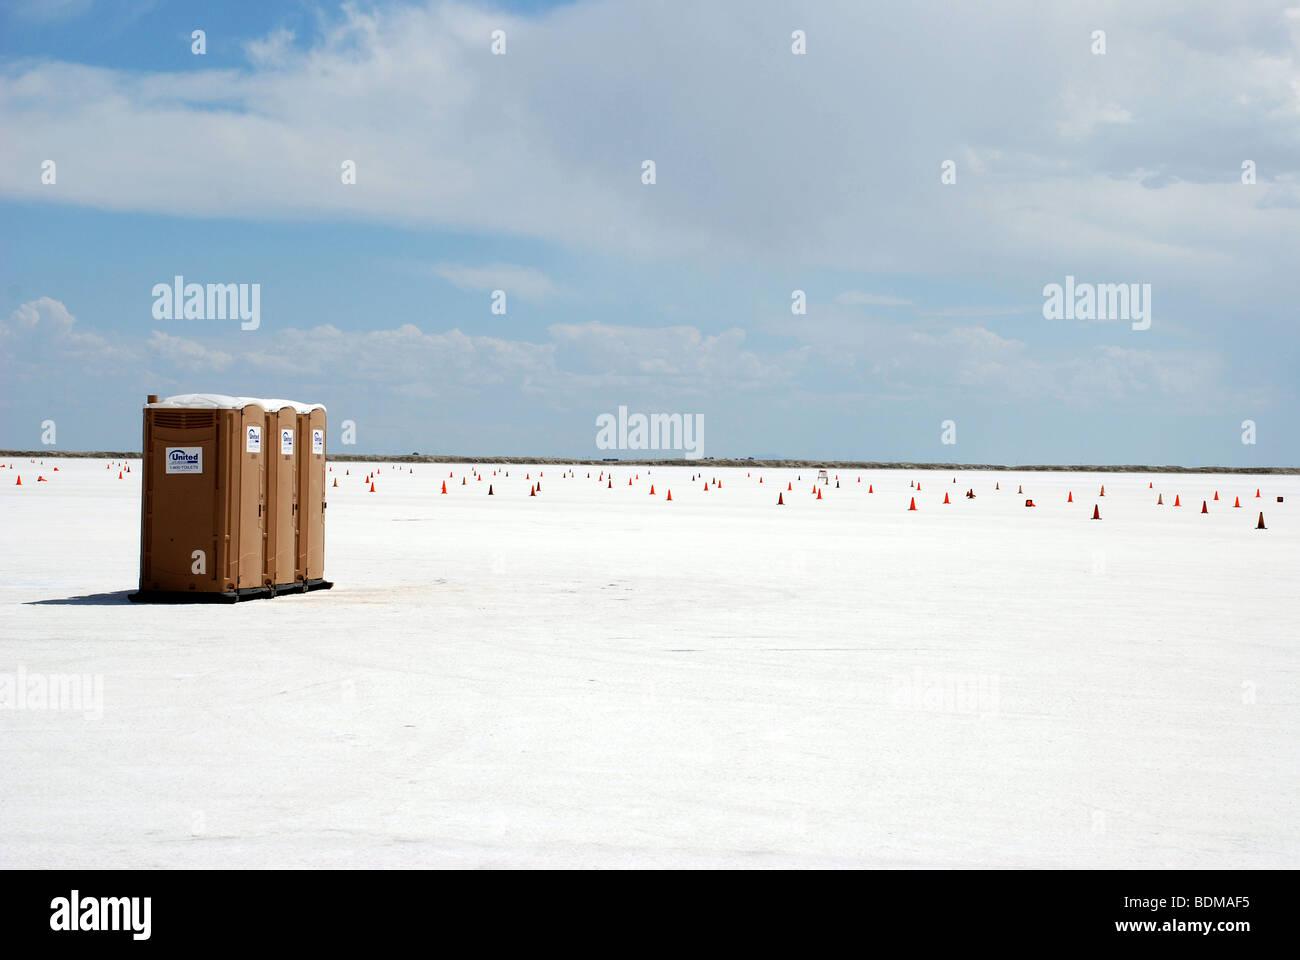 Bonneville Salt Flats, Utah, USA, Stock Photo